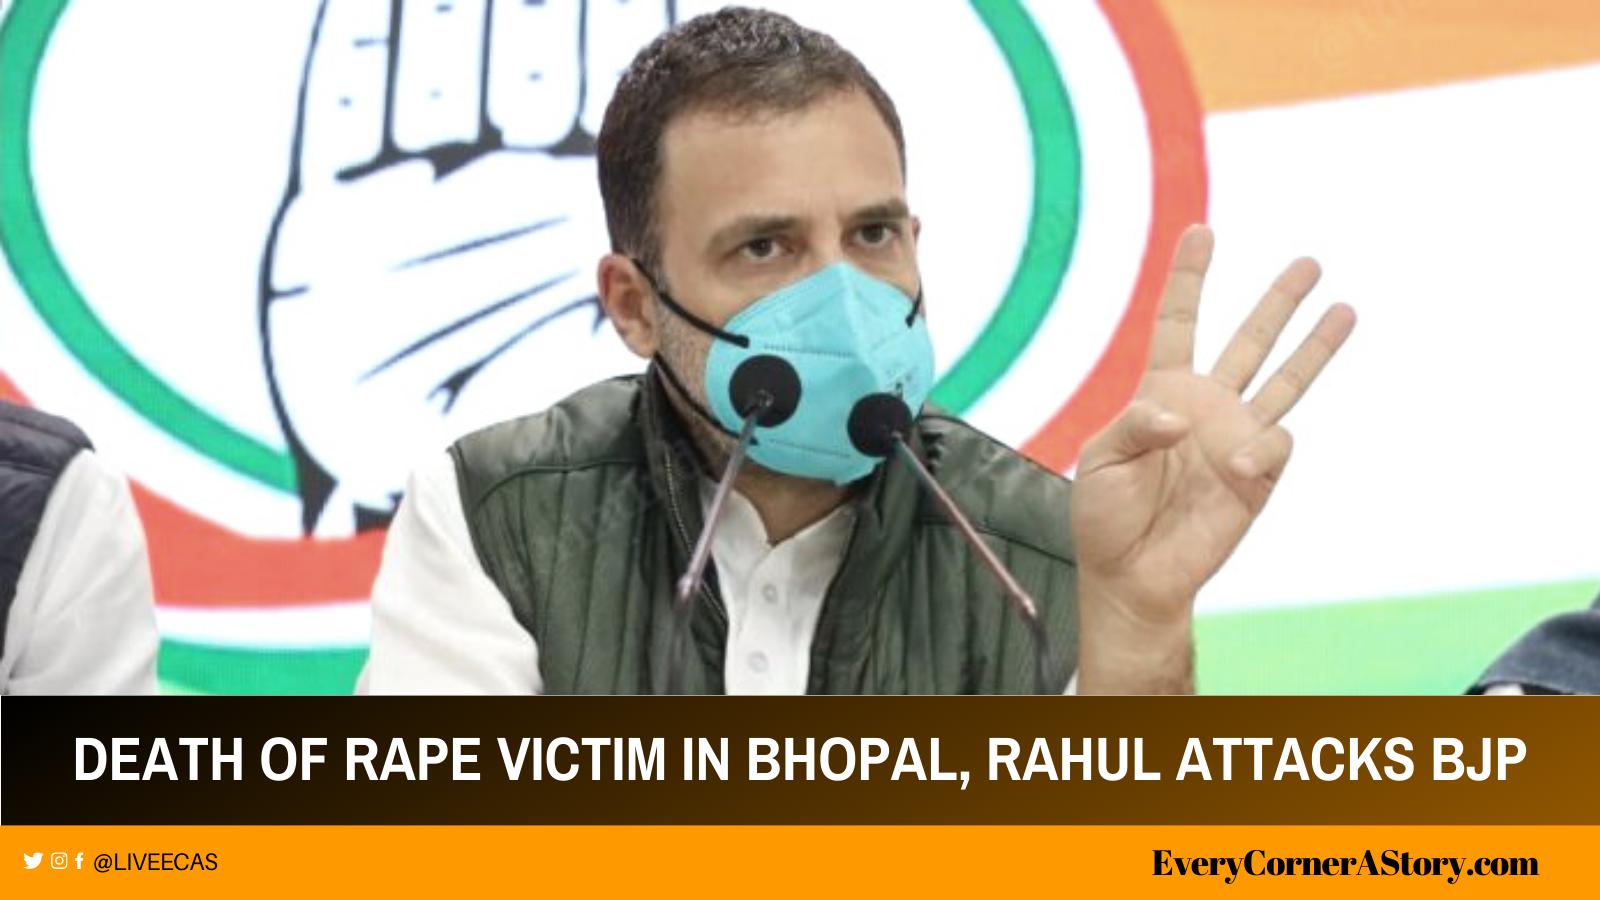 The BJP government fails to defend women around everywhere, Rahul Gandhi attacks BJP